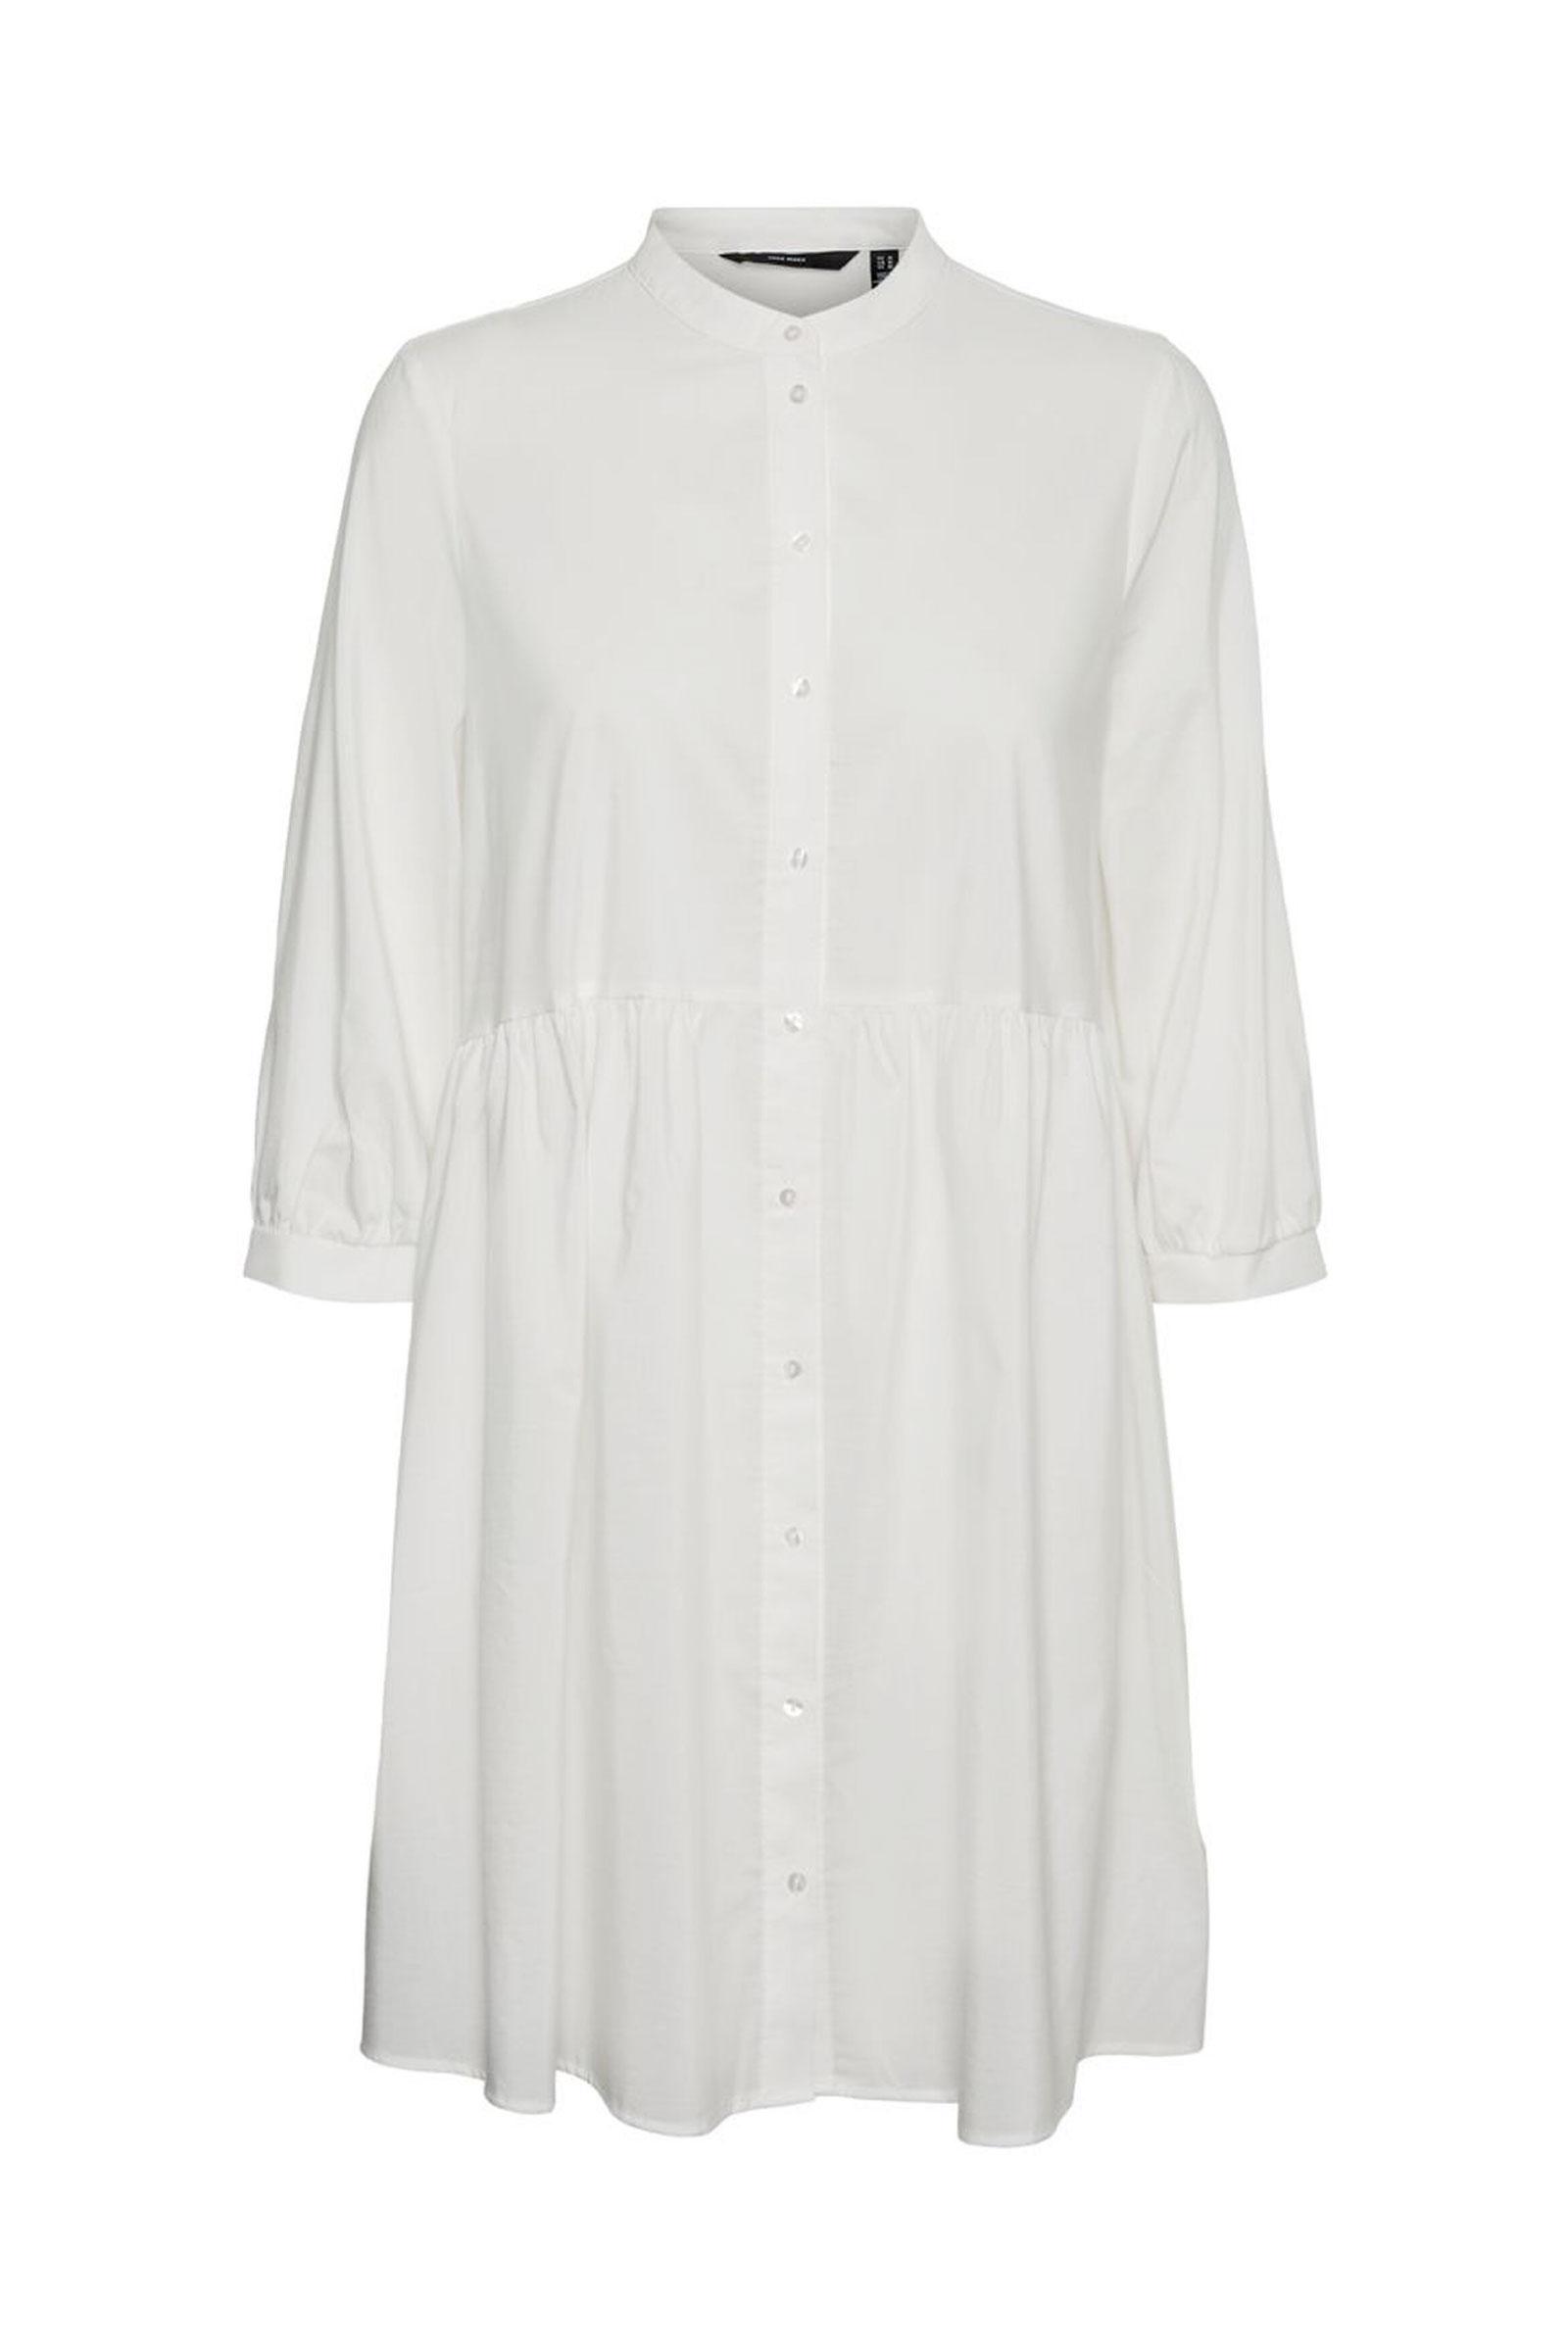 VERO MODA Woman Dress VERO MODA | Dress | 10248640Snow White